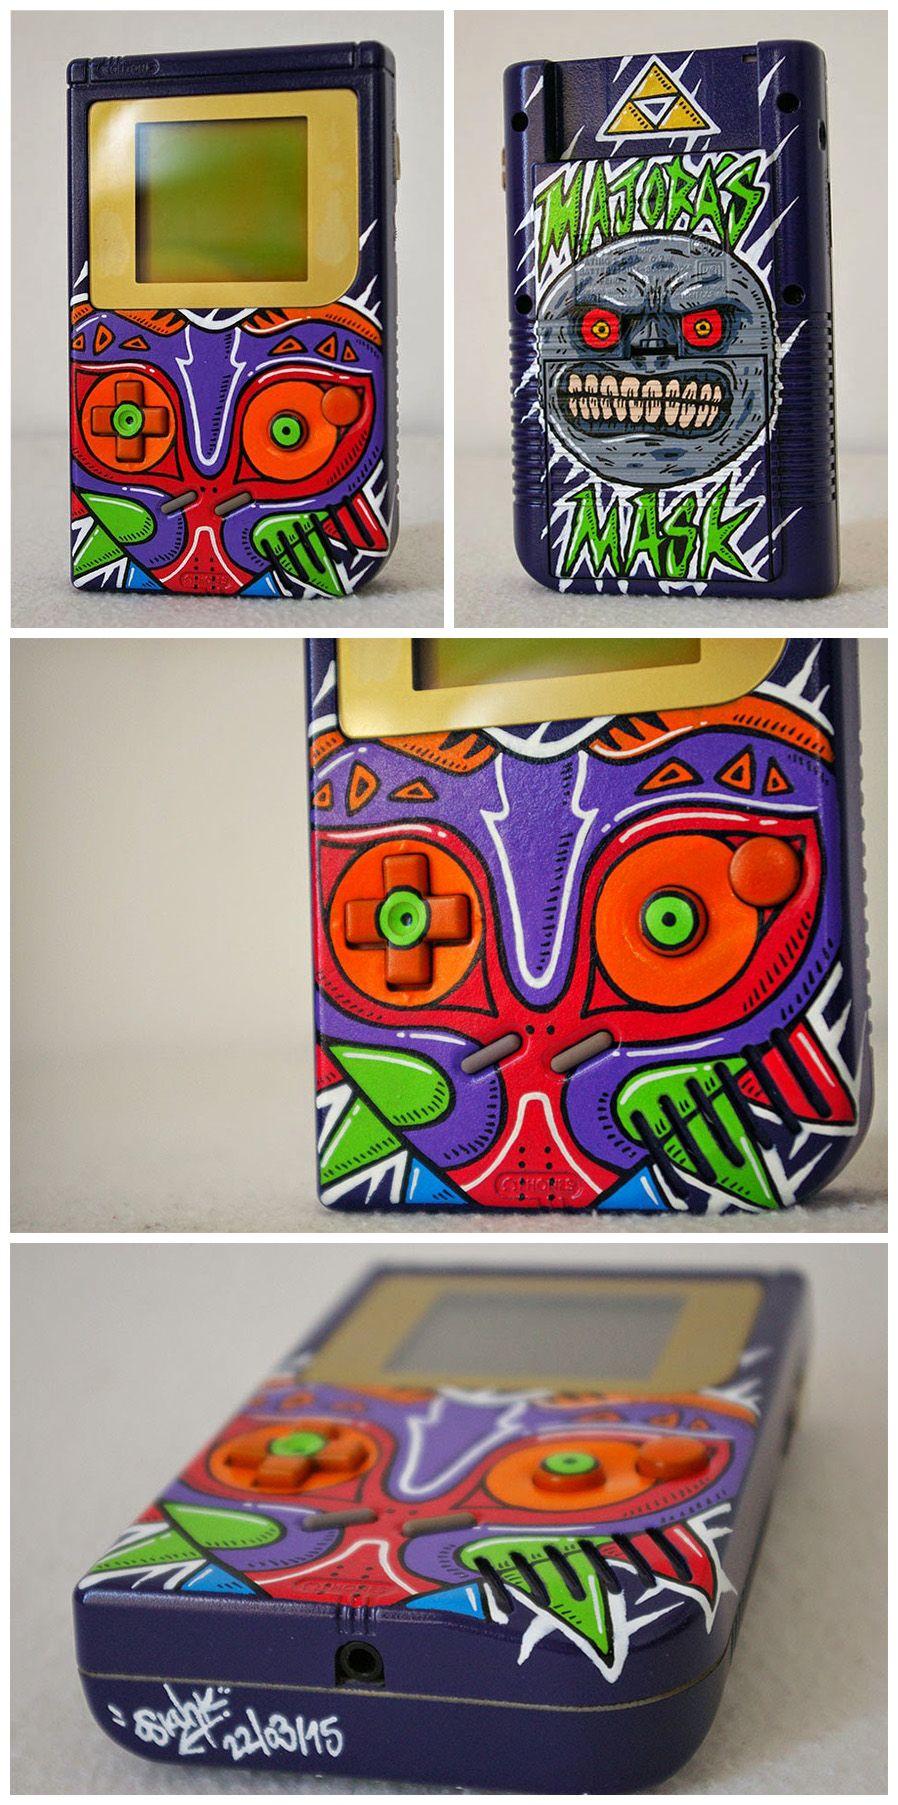 Game boy color legend of zelda - Custom Art Custom Game Boy Legend Of Zelda Majora S Mask